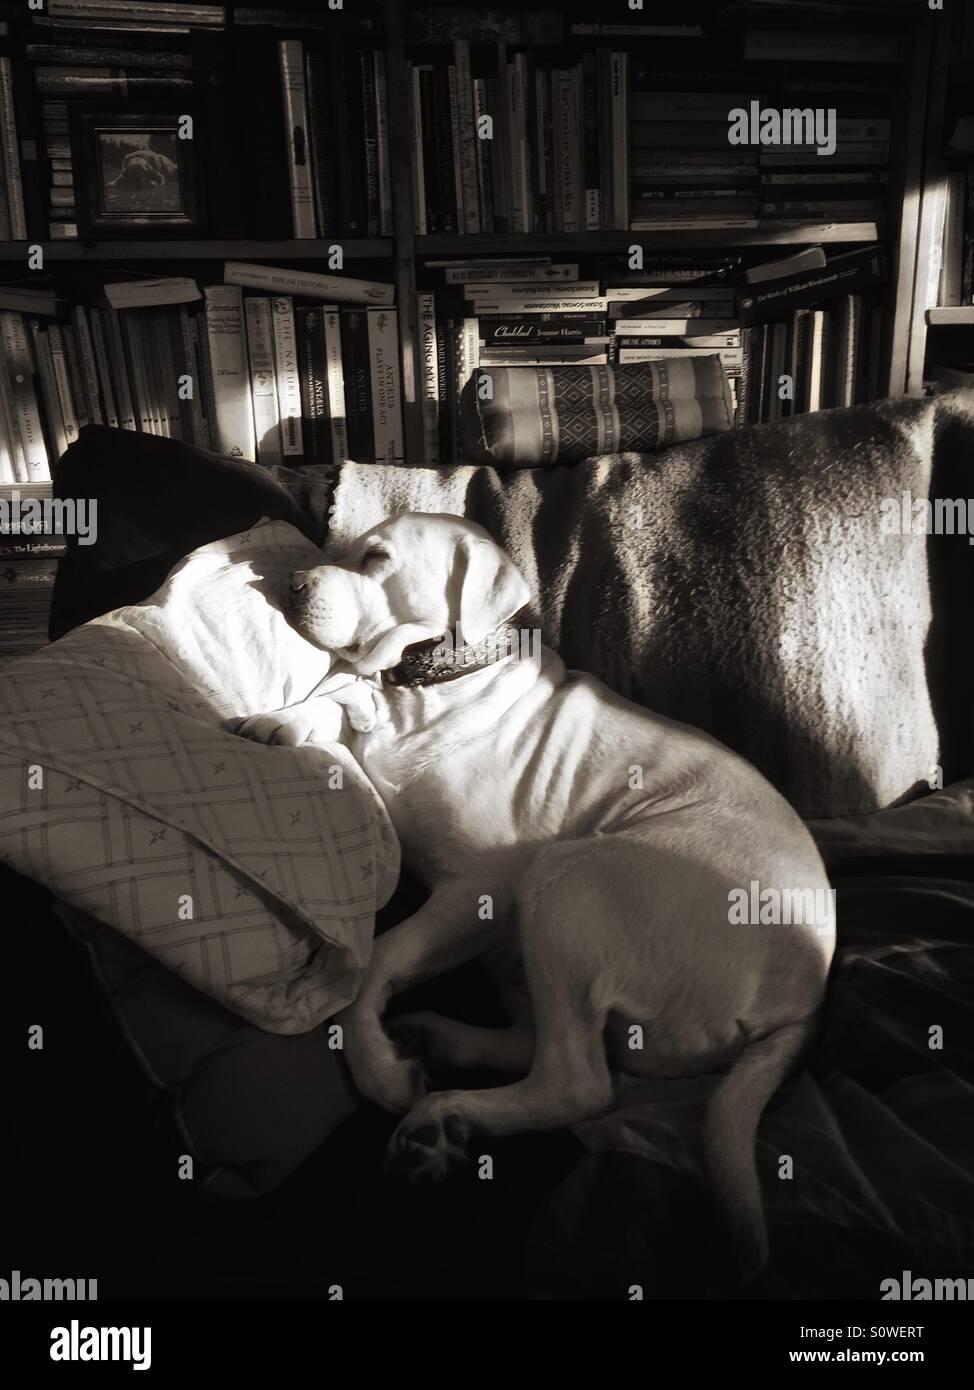 Dog asleep in the sun on a sofa - Stock Image